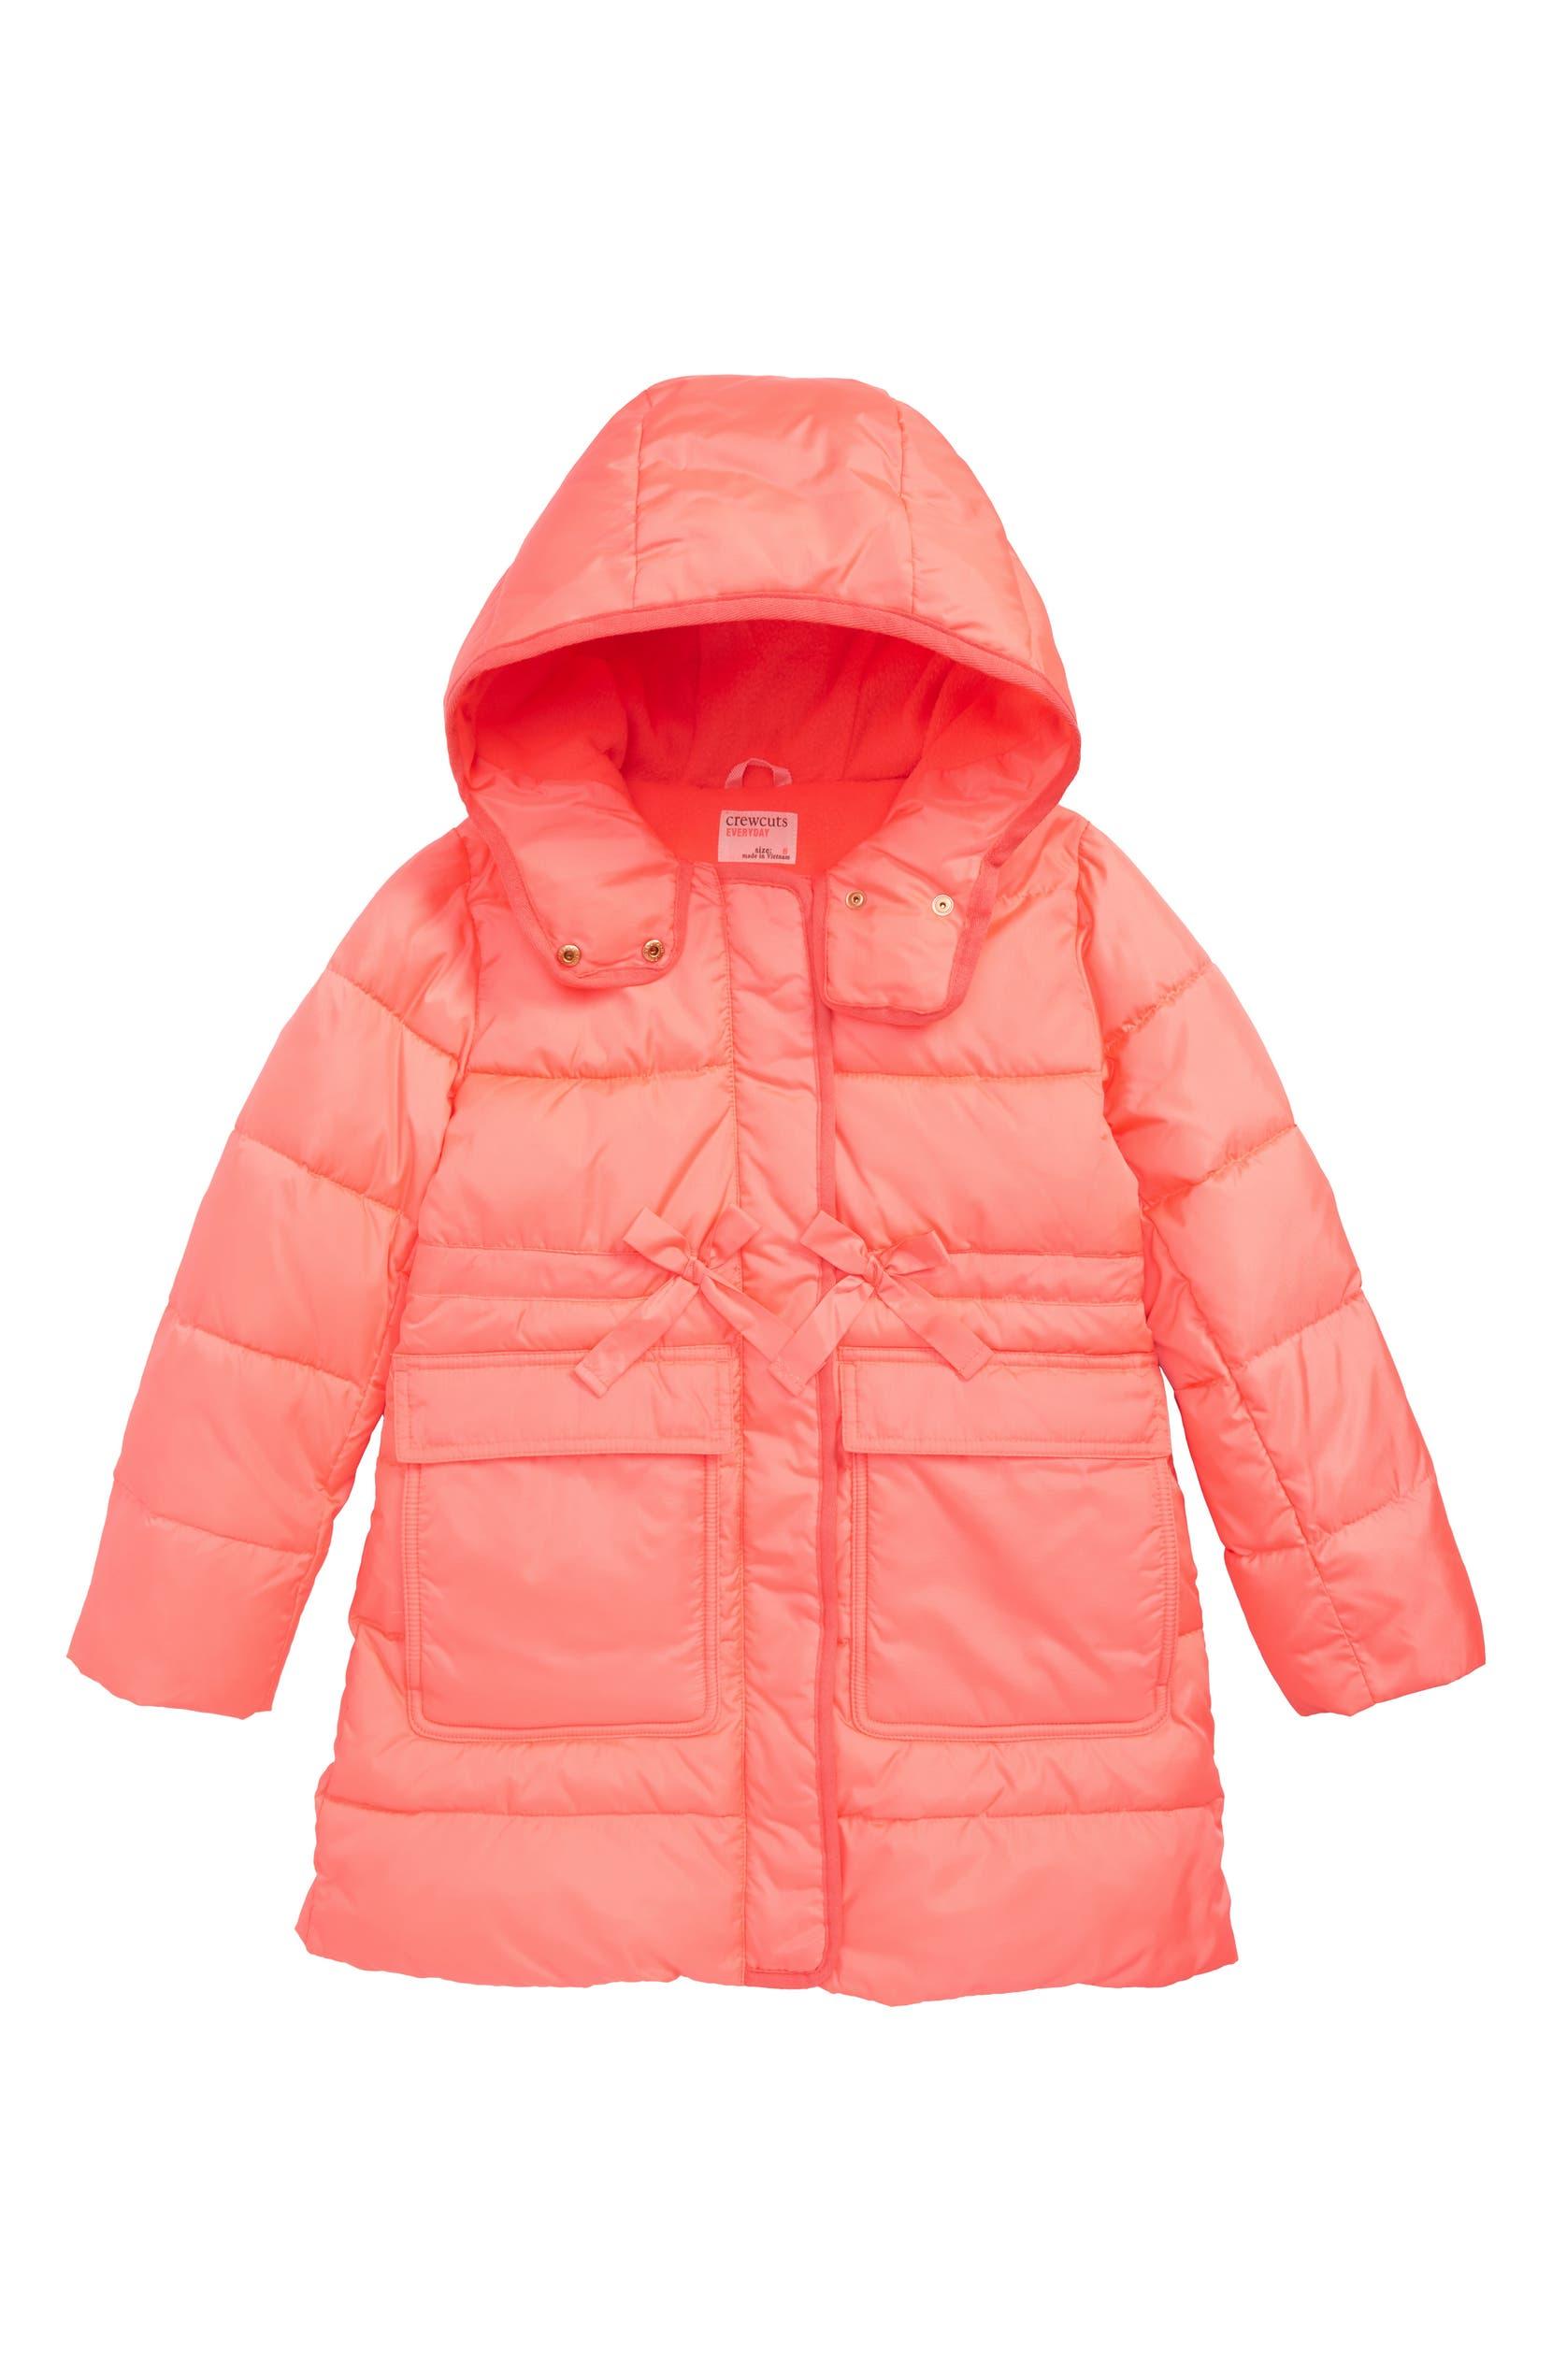 79c9c4350d985 crewcuts by J.Crew Primaloft® Long Puffer Coat (Toddler Girls ...